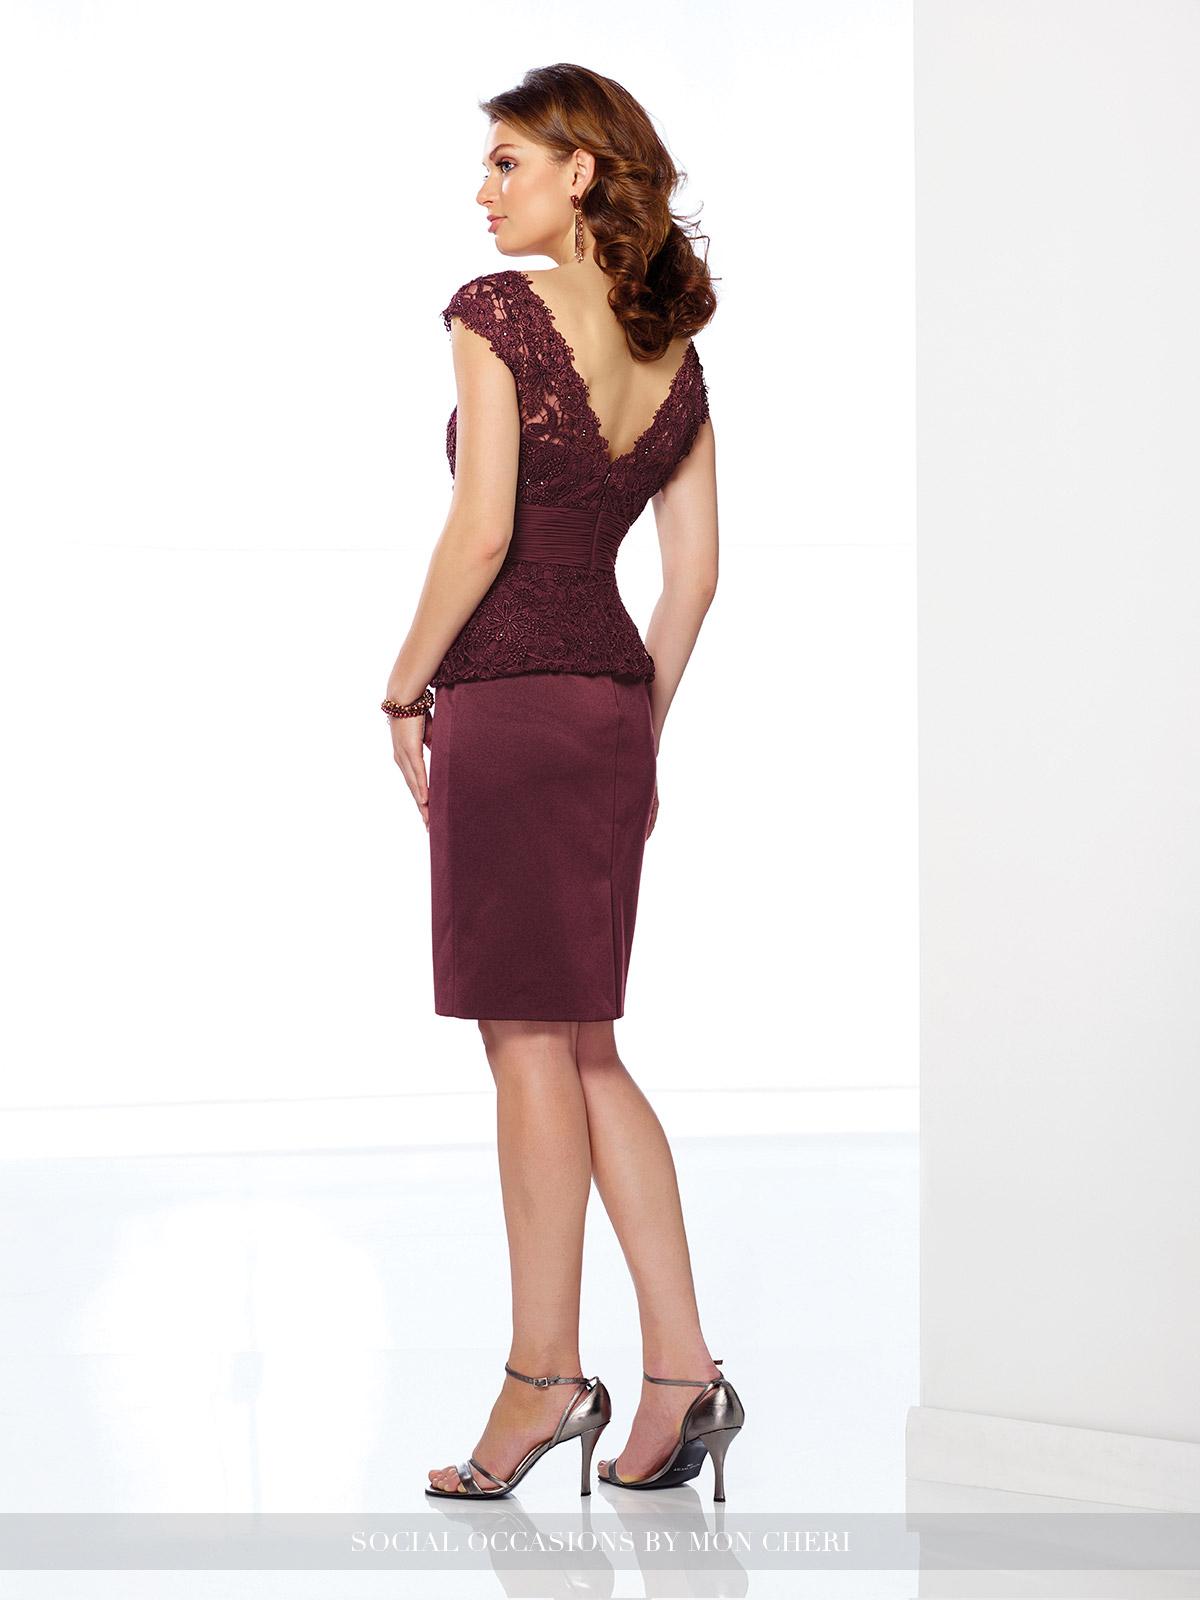 216883 burgundy dress Social Occasion Dresses 2017 by Mon Cheri